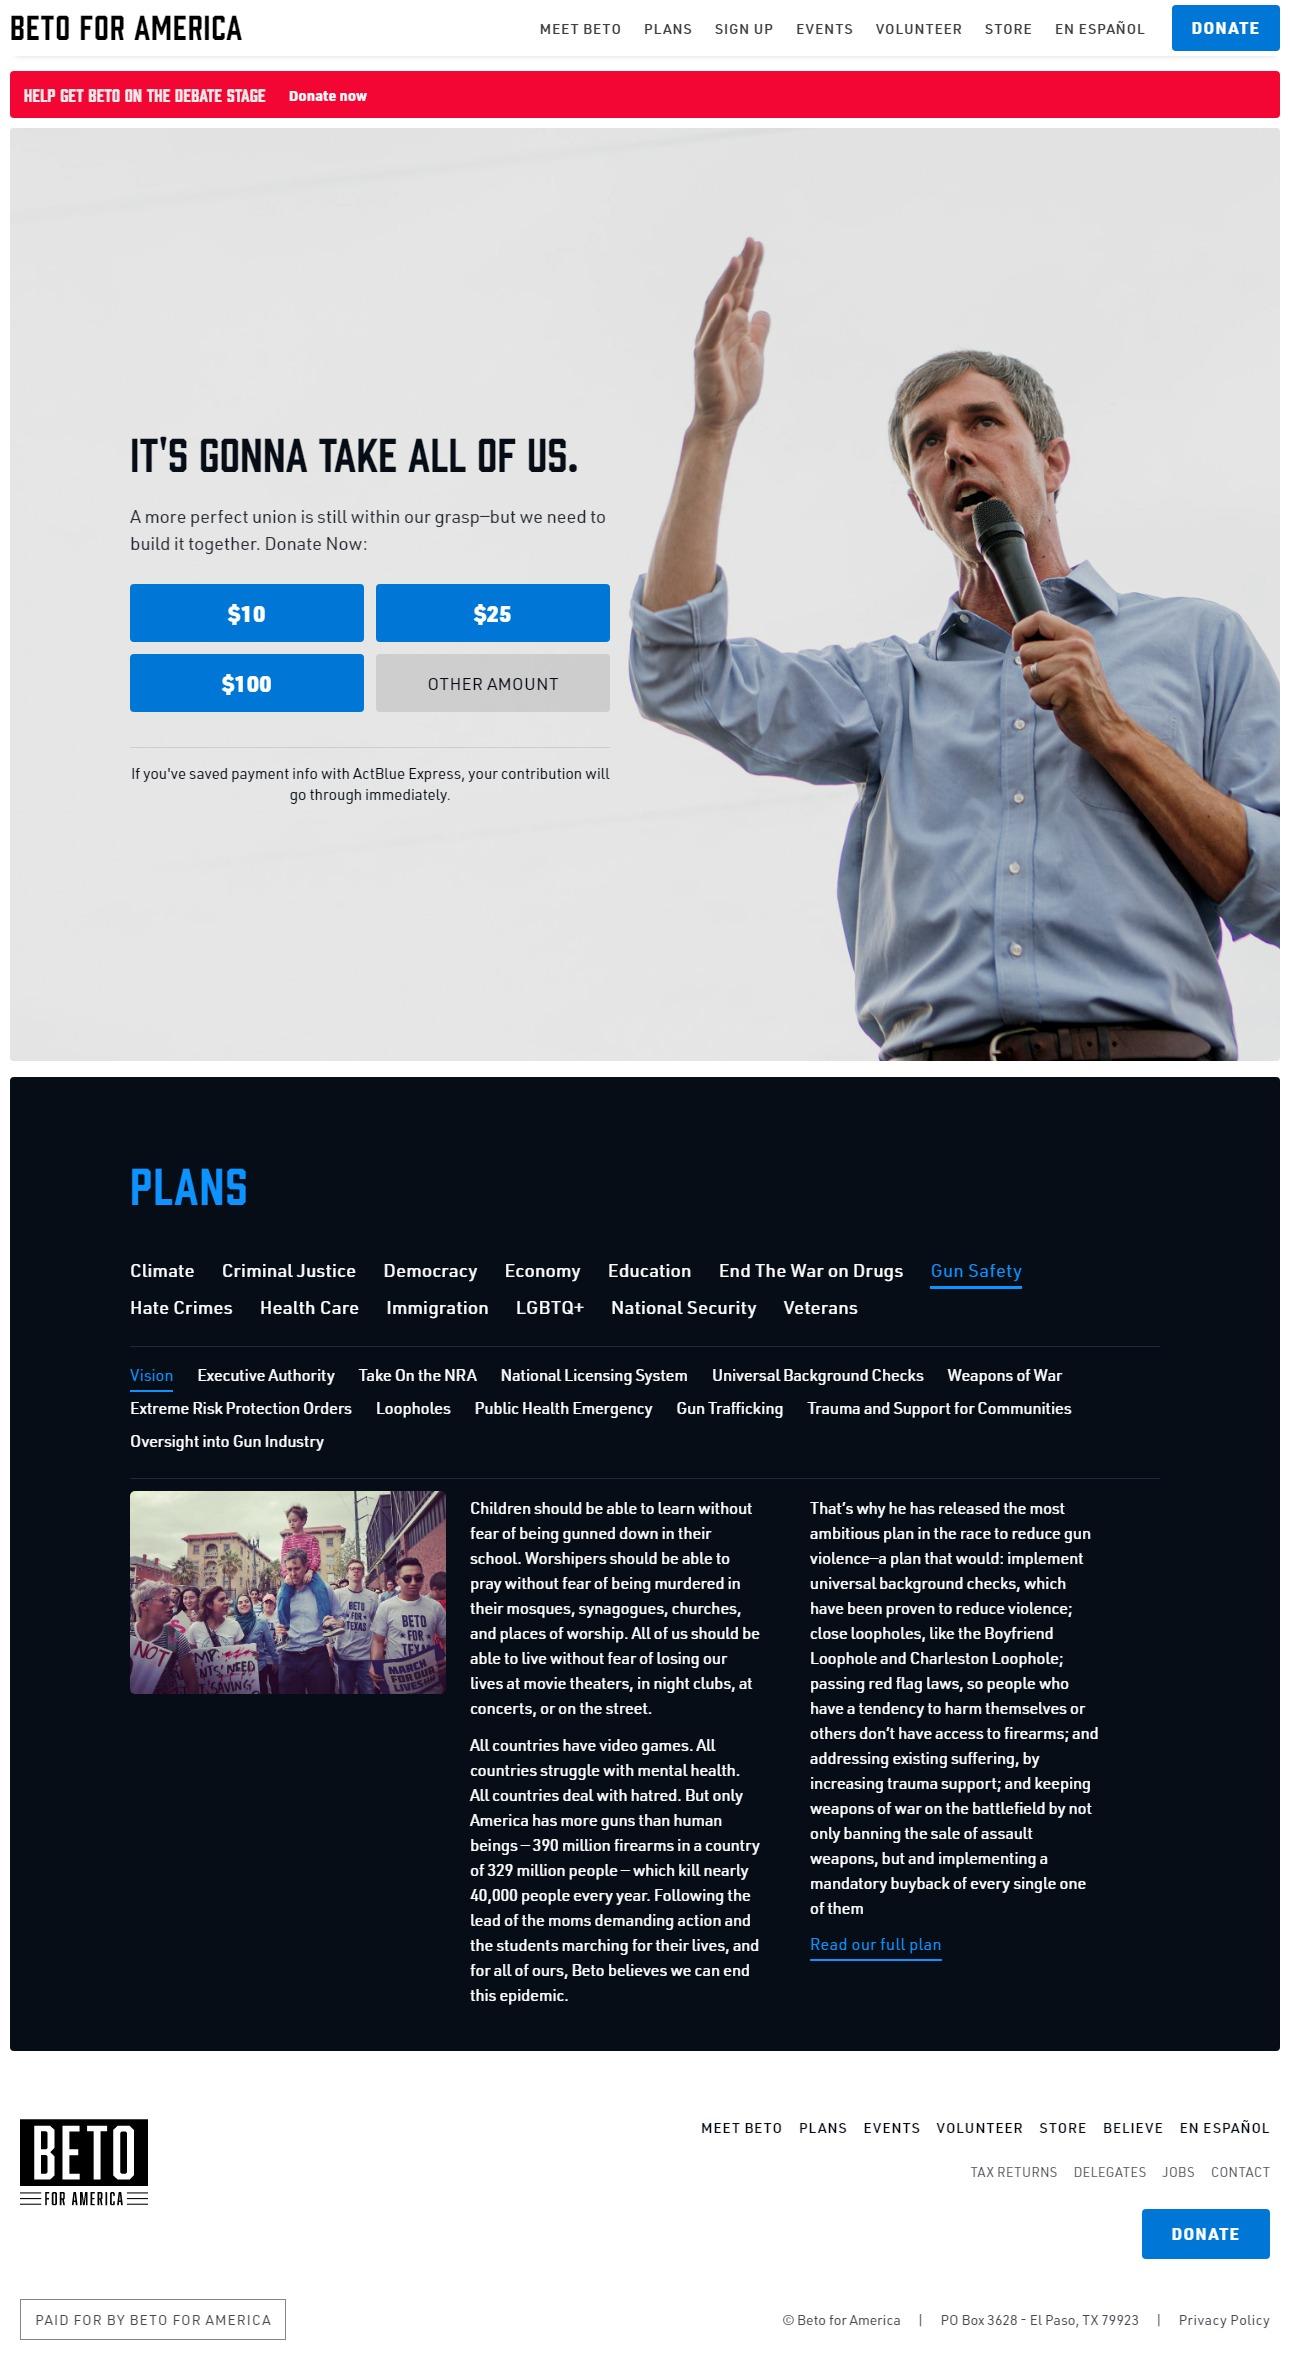 Homepage Snapshot for November 1, 2019: Former Representative Beto O'Rourke